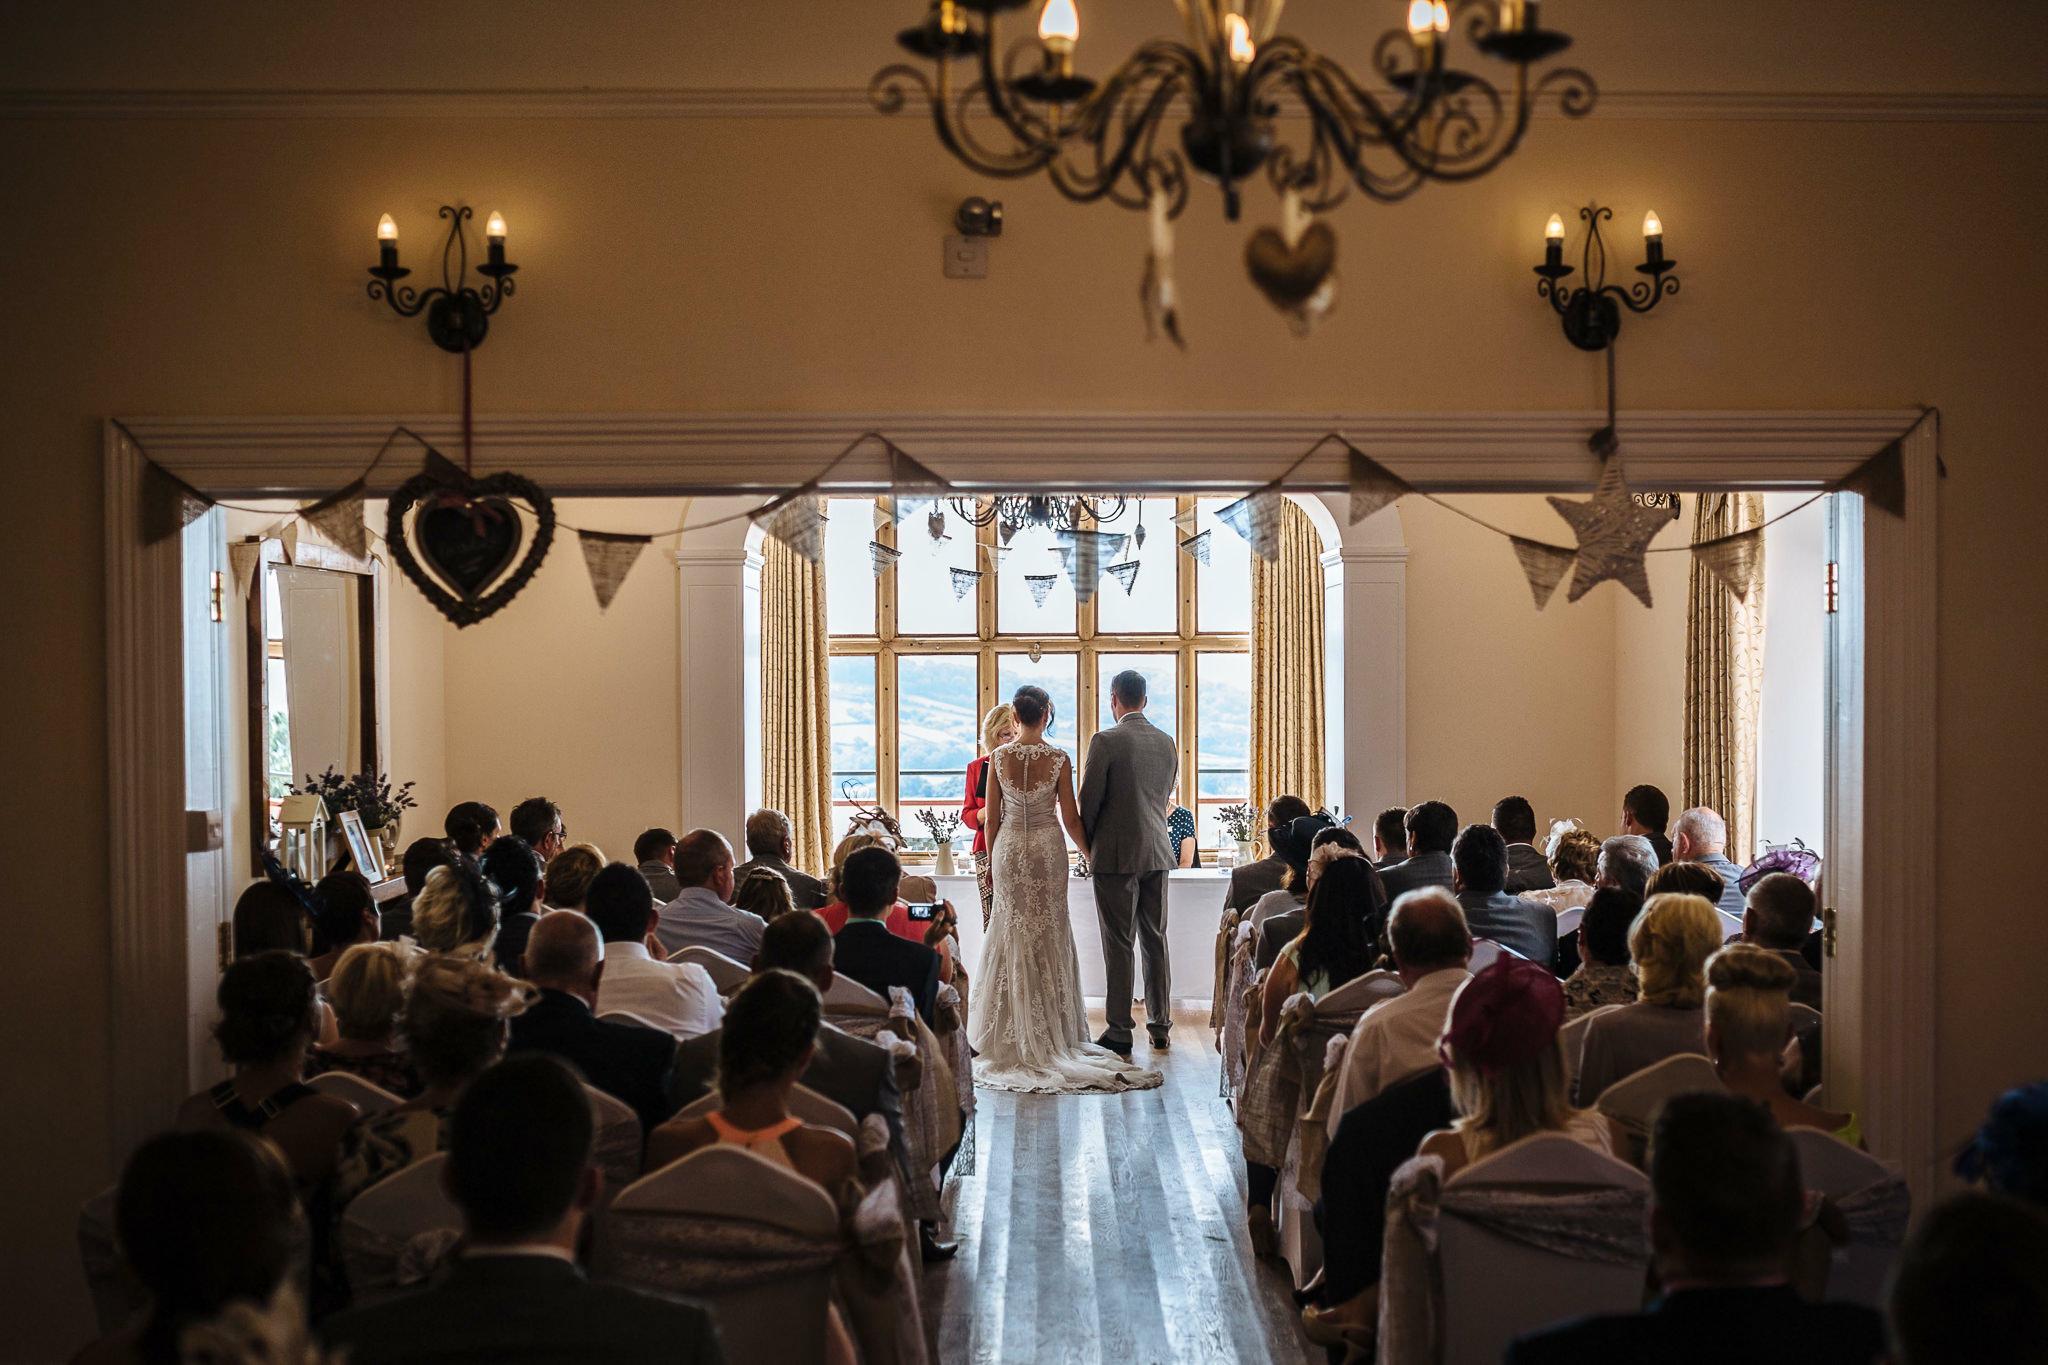 paul-marbrook-Caer-Llan-Wedding-Photographer-90040